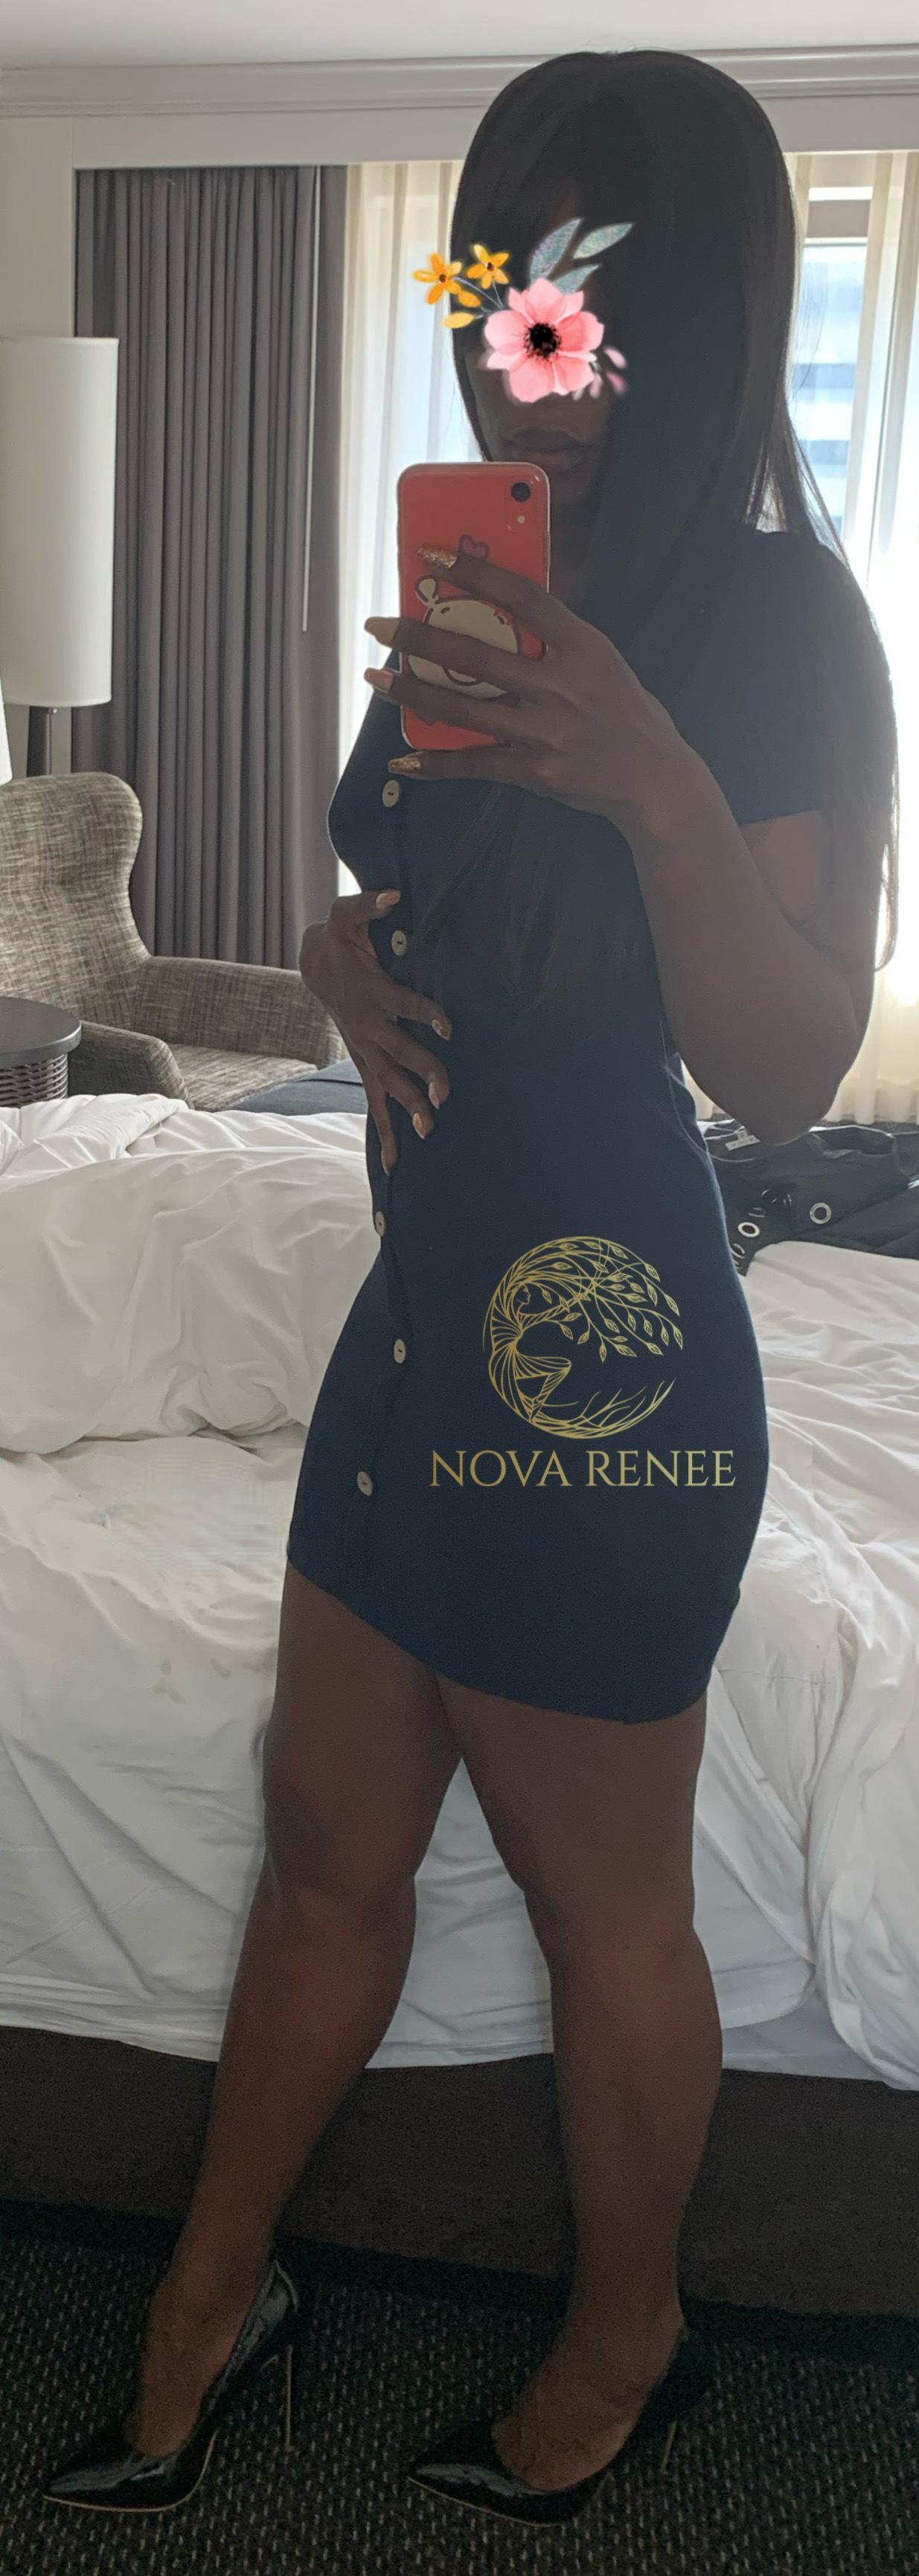 Nova Renee